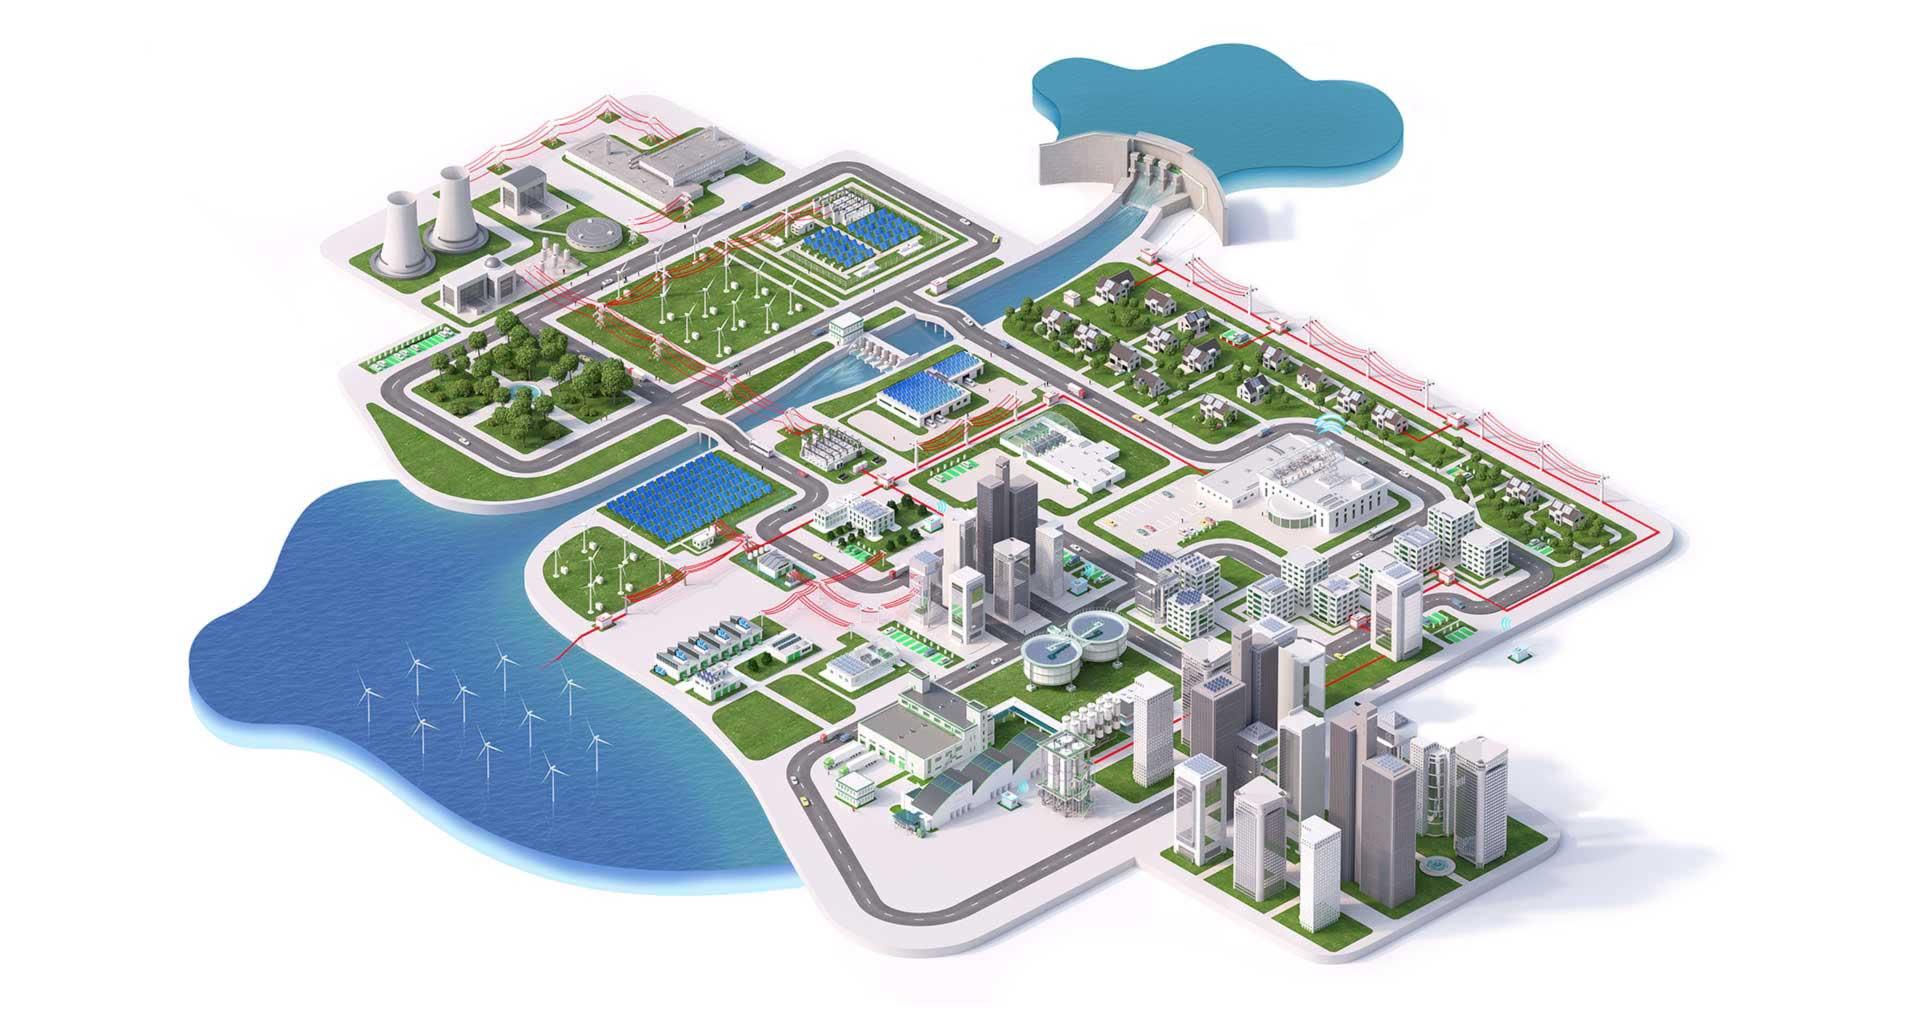 Schneider Electric Launches Ecostruxure Grid In Jaipur